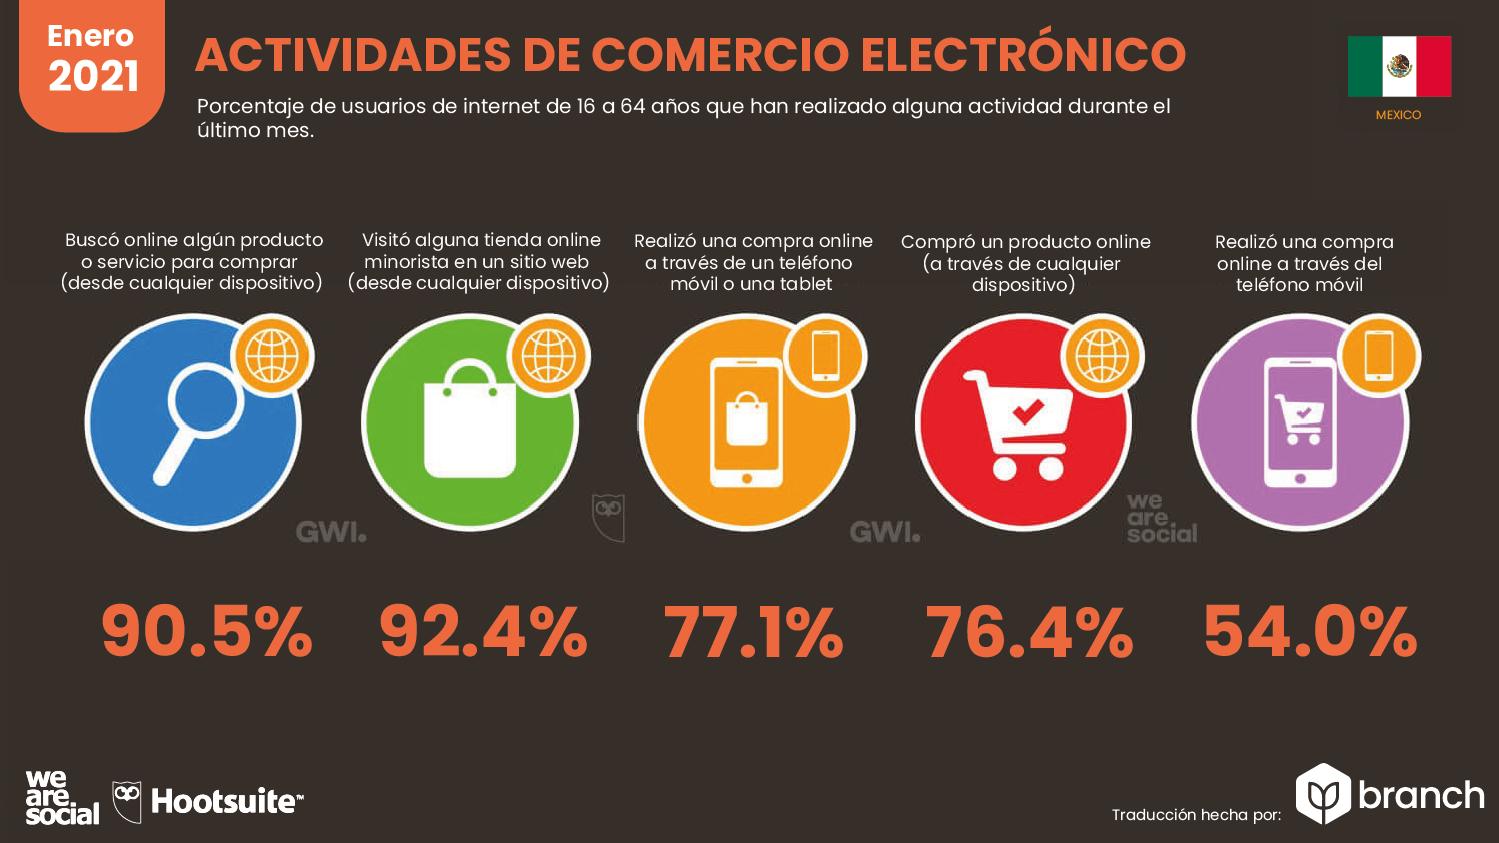 actividades-de-ecommerce-mexico-2020-2021